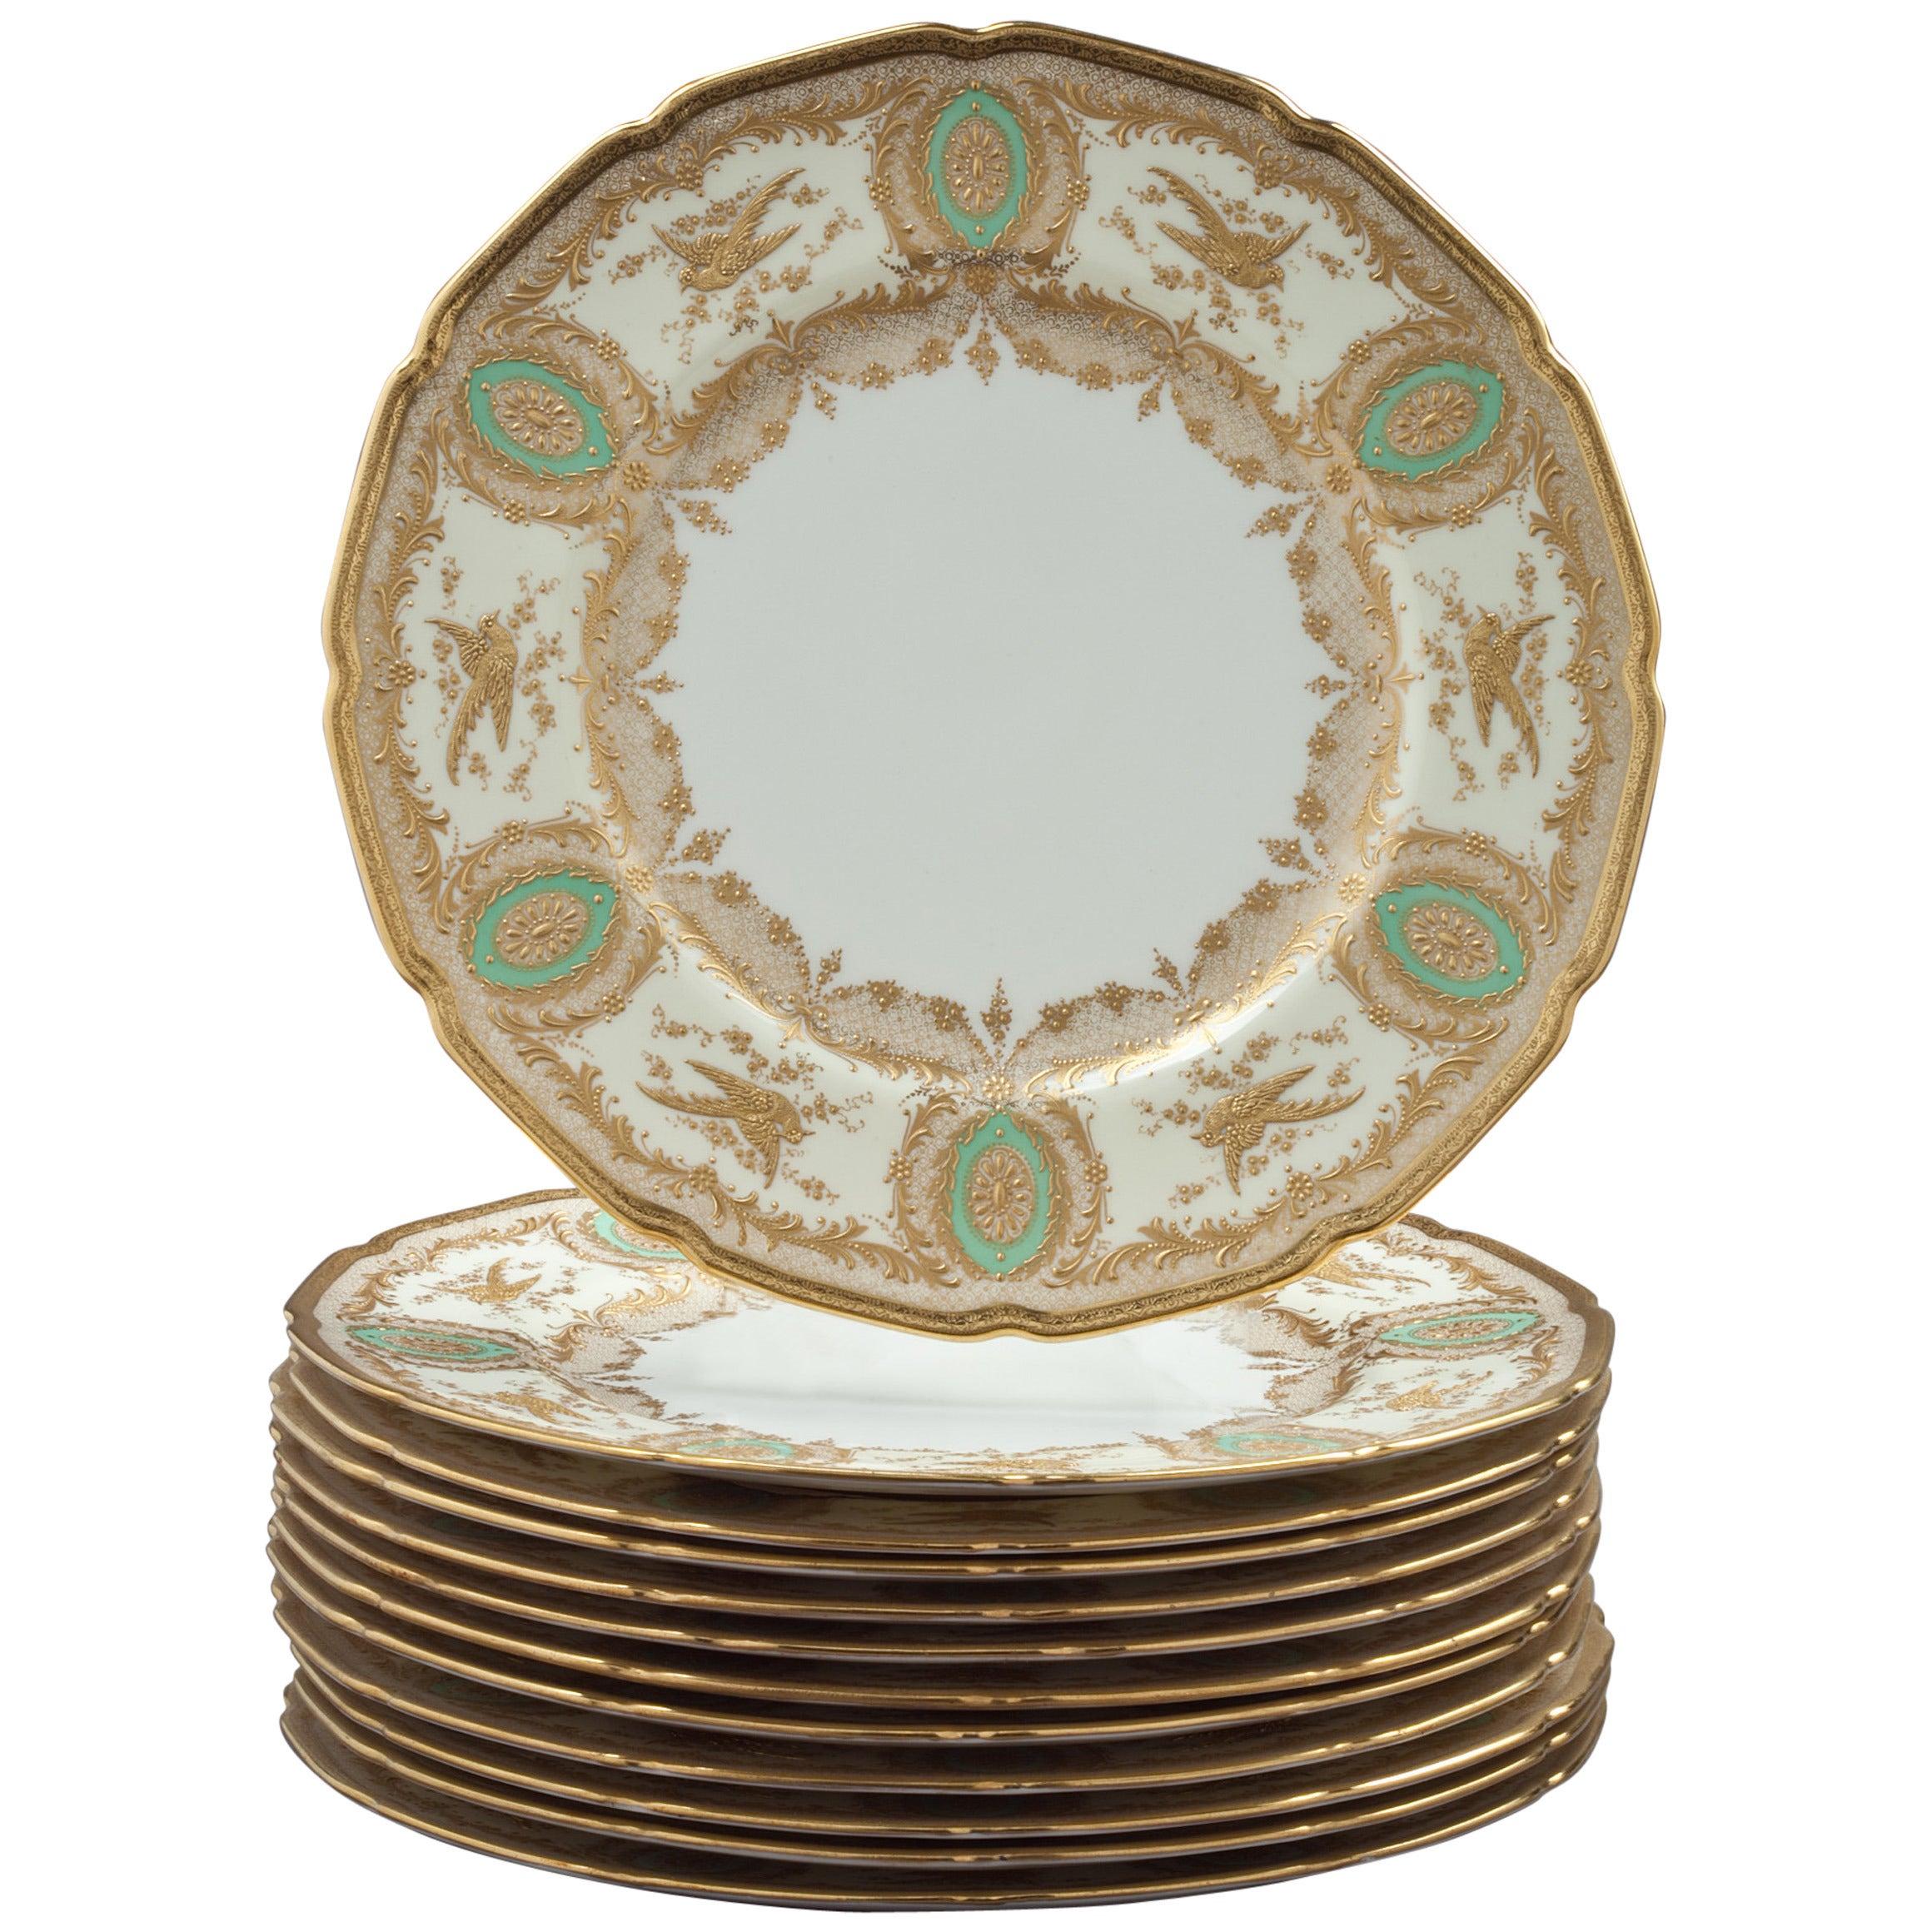 Set of 12 English Porcelain Dinner Plates, Royal Doulton, circa 1900